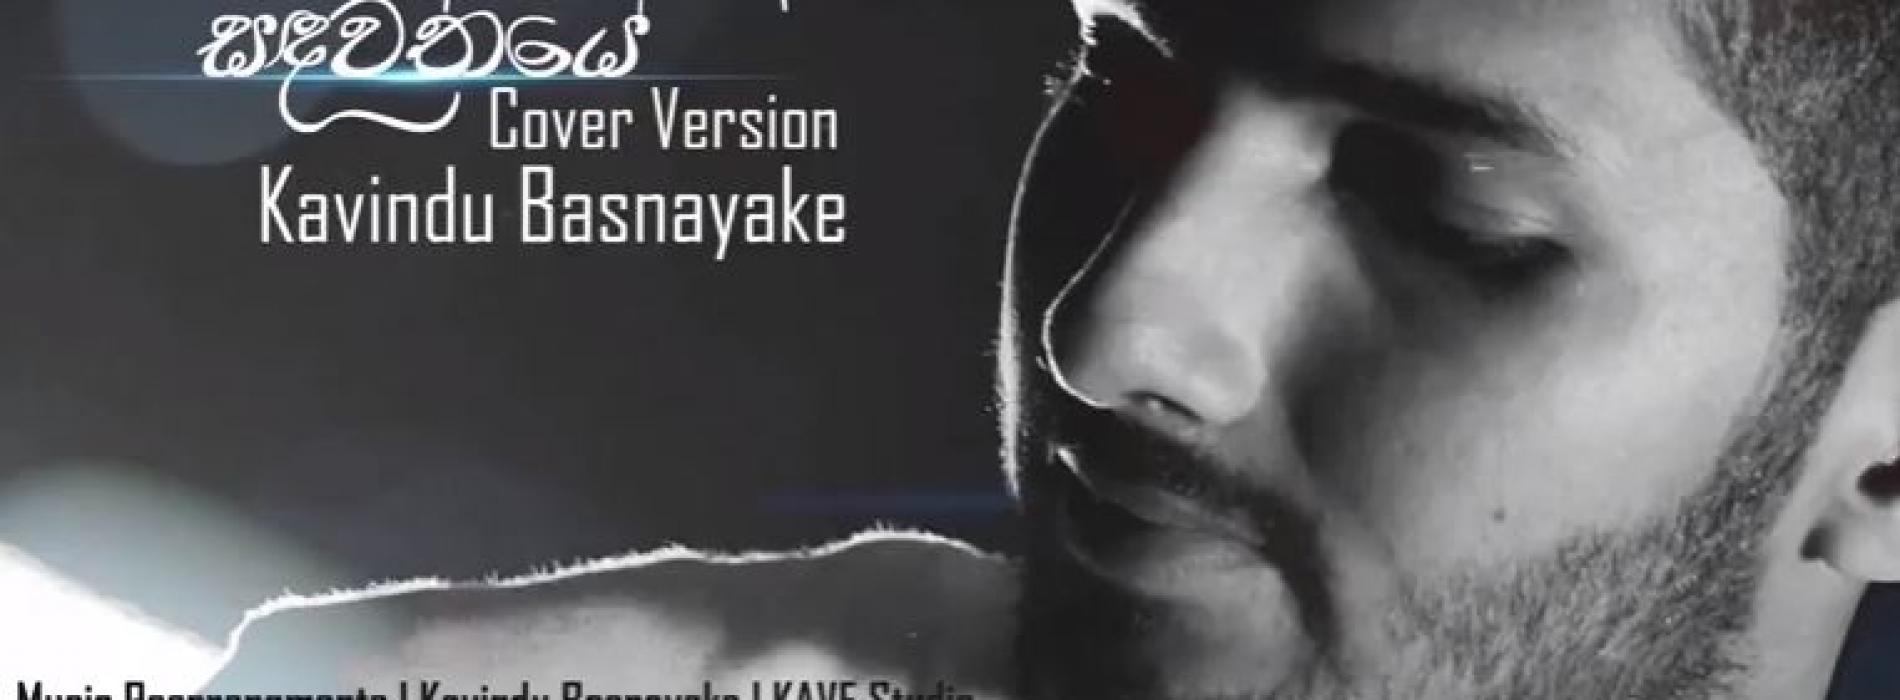 Kavindu Basnayake – Sandawathiye | Ridma Weerawardena | Charitha Attalage (Cover)